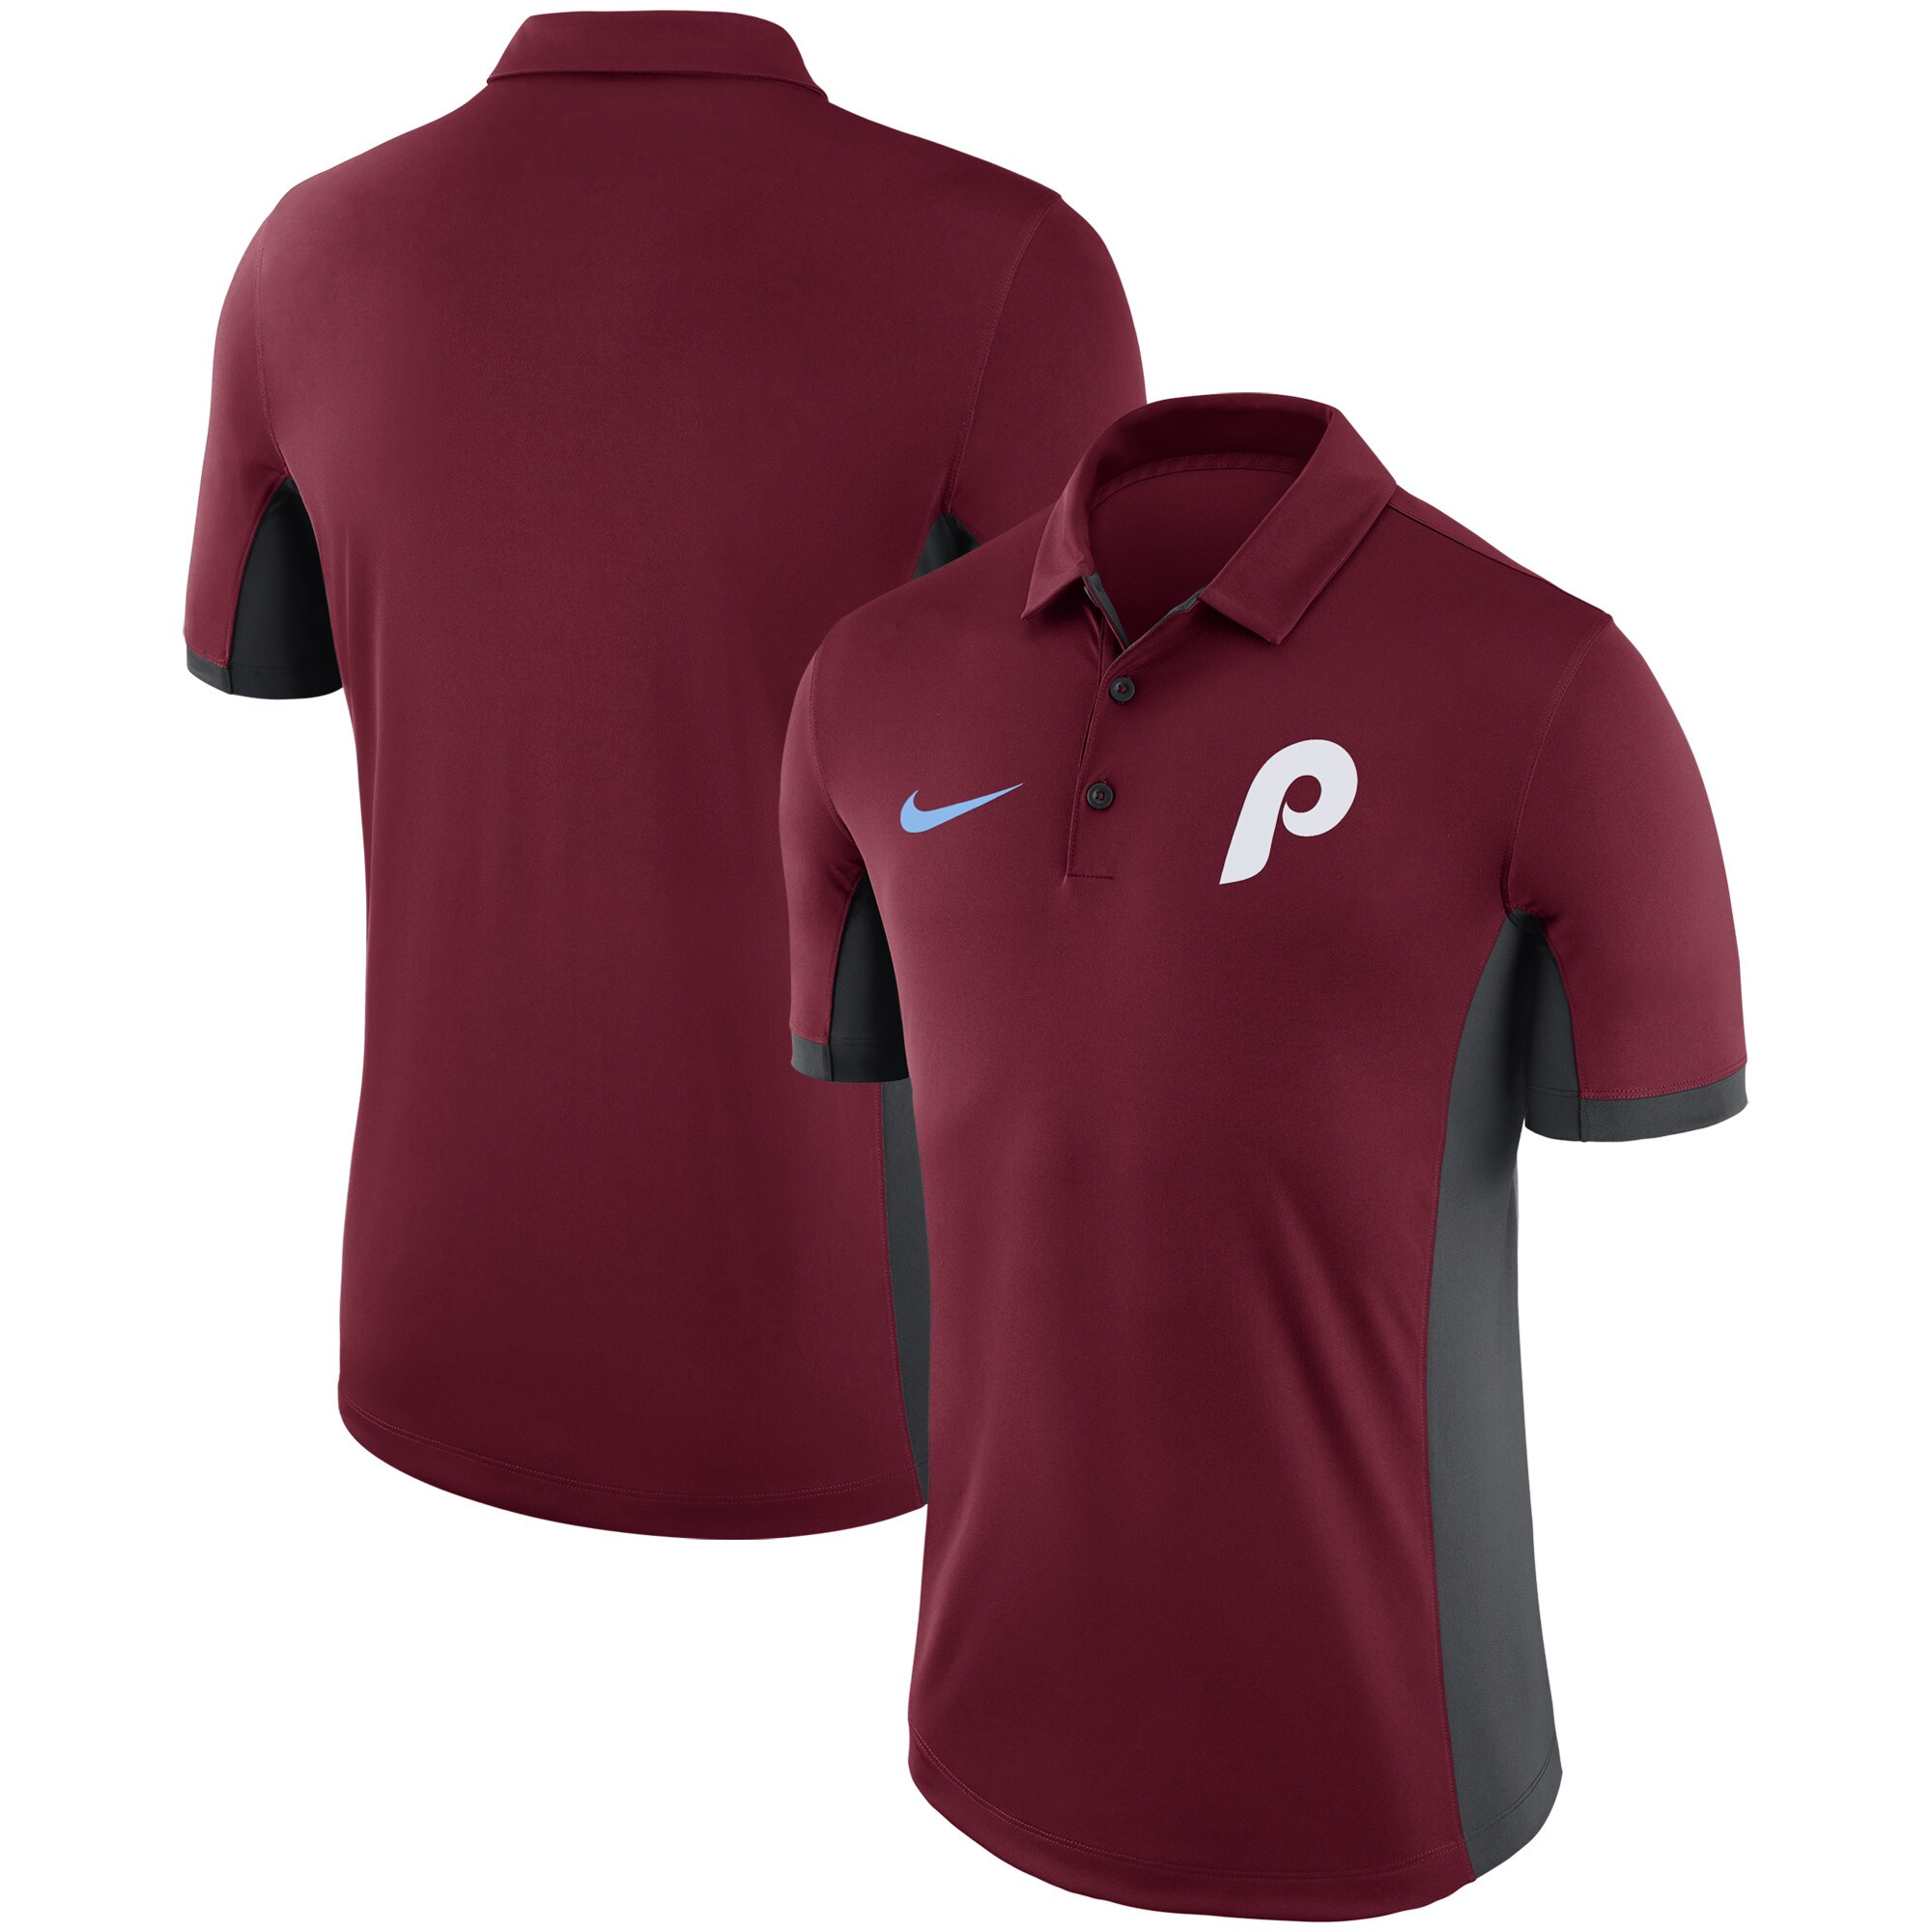 Philadelphia Phillies Nike Performance Franchise Polo - Maroon